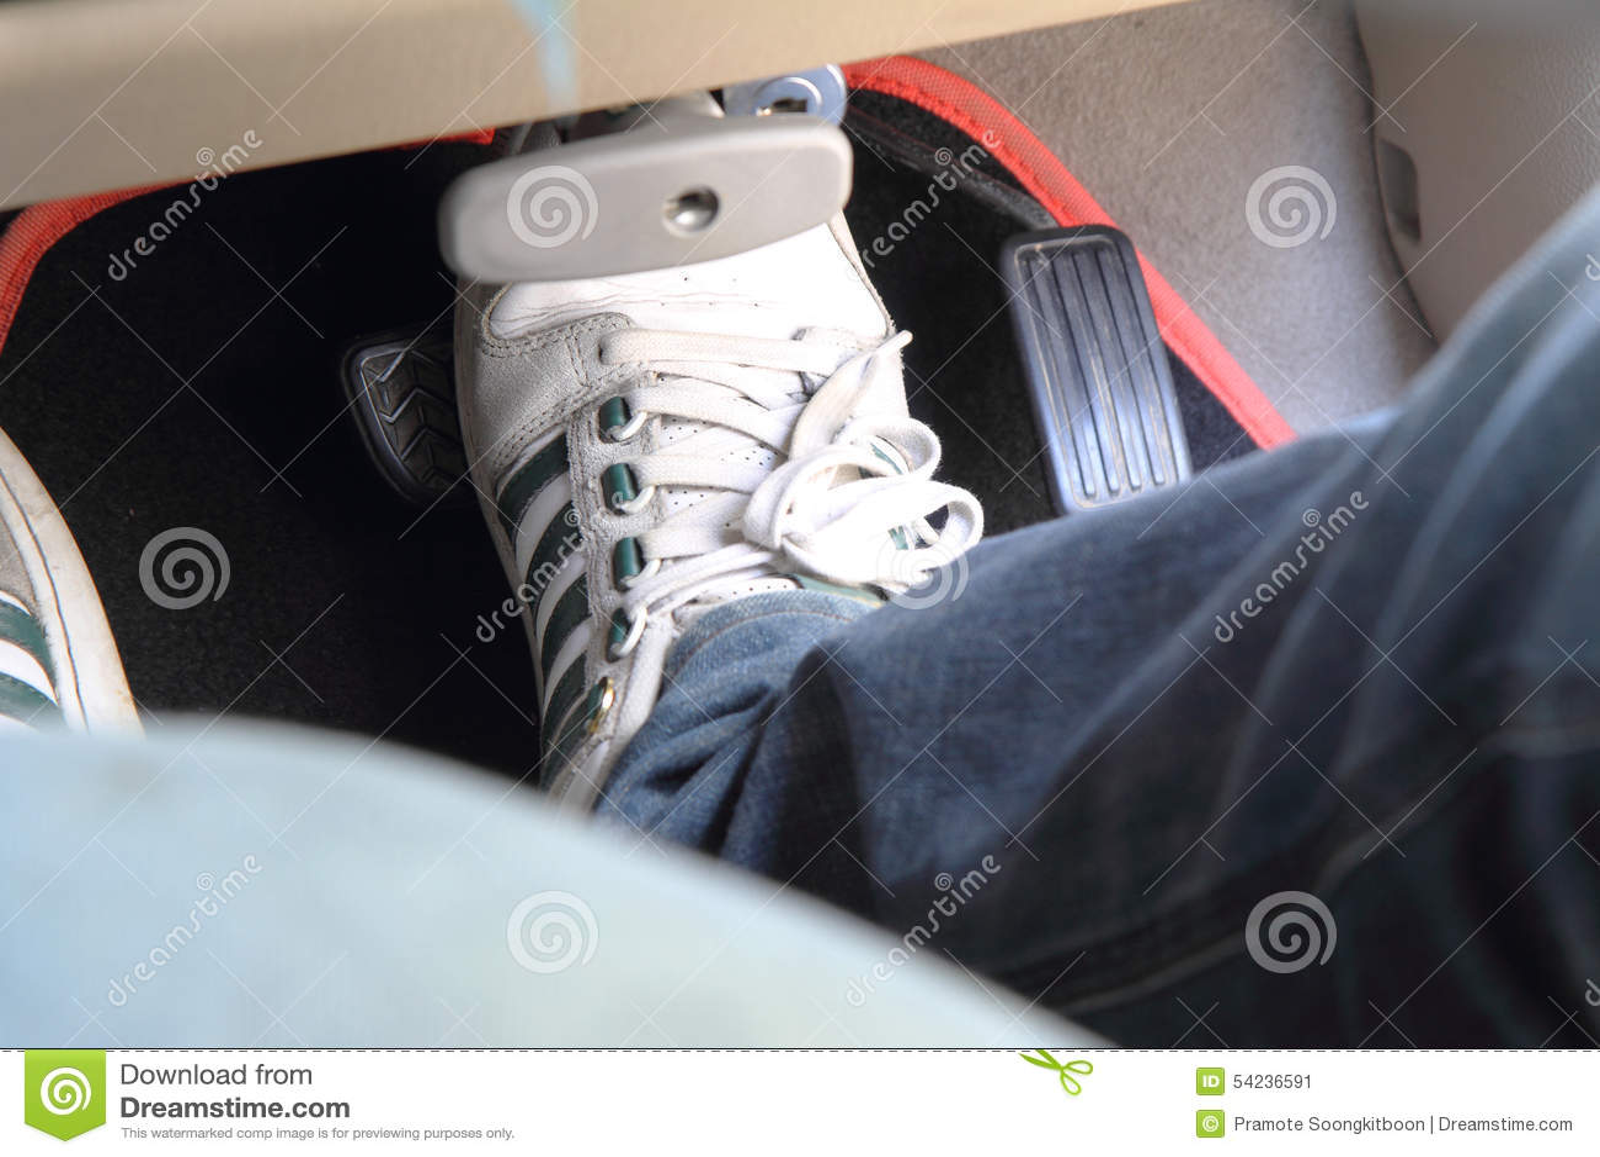 Break Pedal In The Car Stock Photo Image 54236591